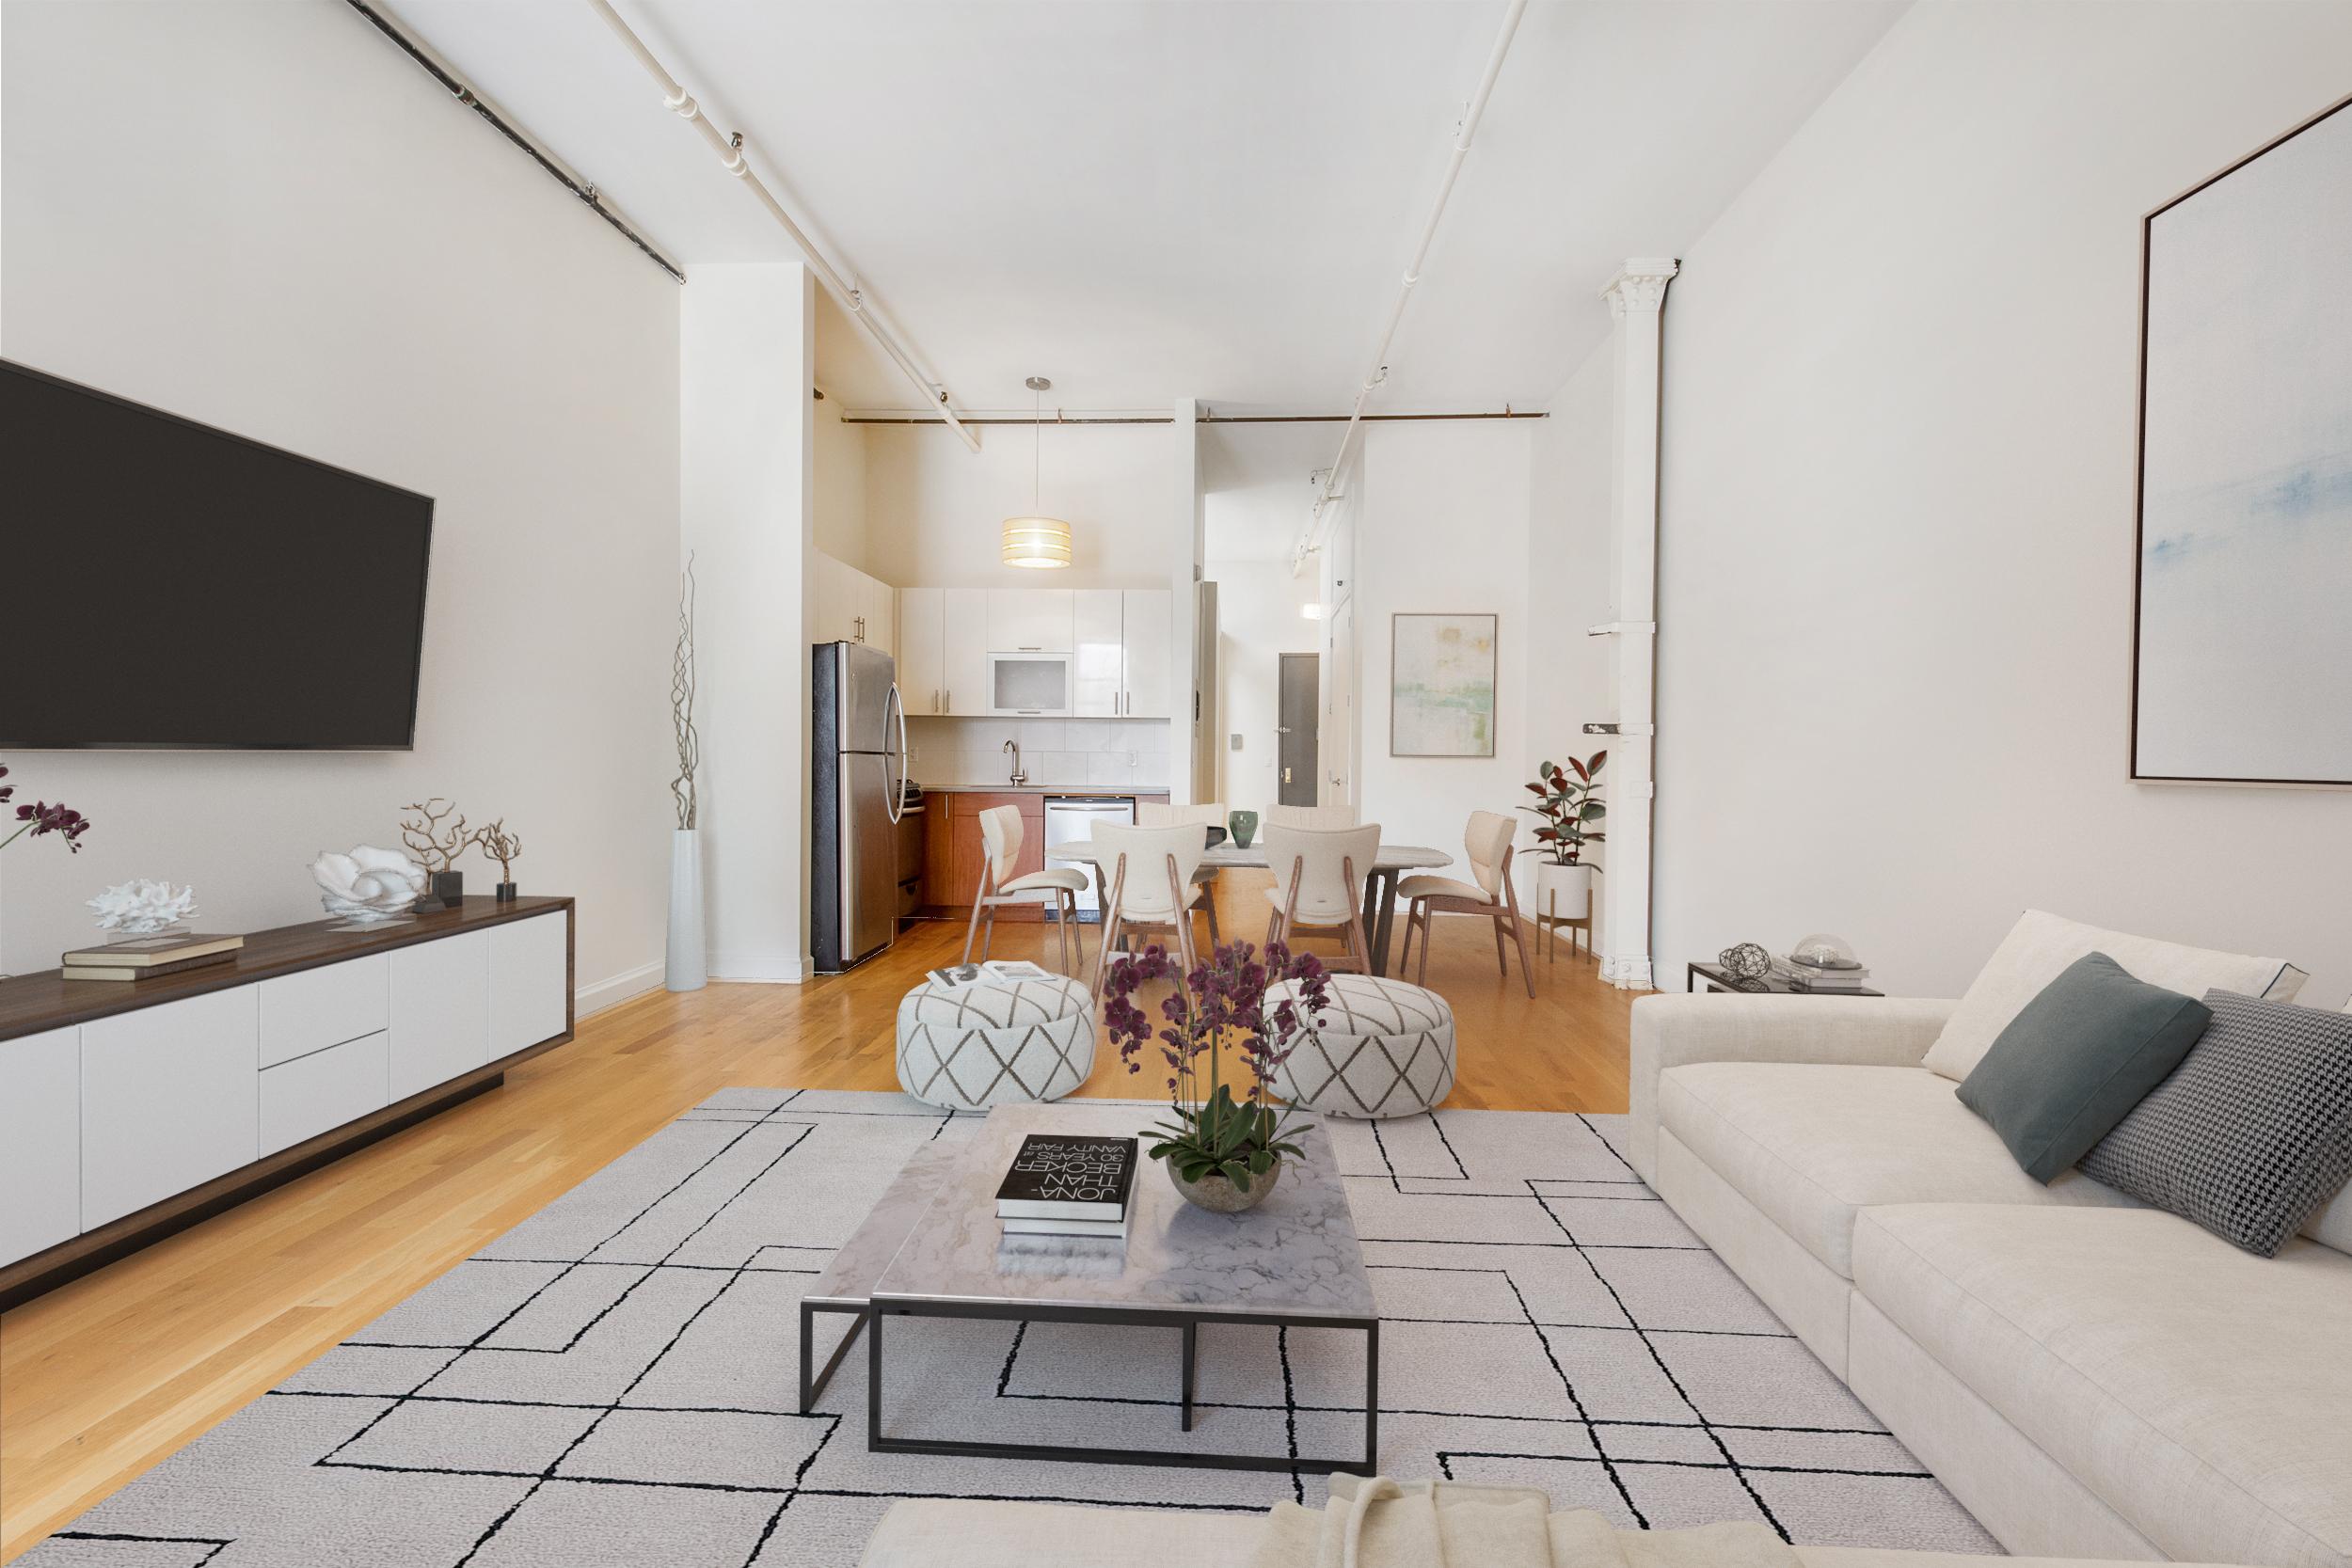 460 Driggs Ave, 206 - Williamsburg | Brooklyn    1 Bedroom // 1 Bath Leased Price:    $3,150